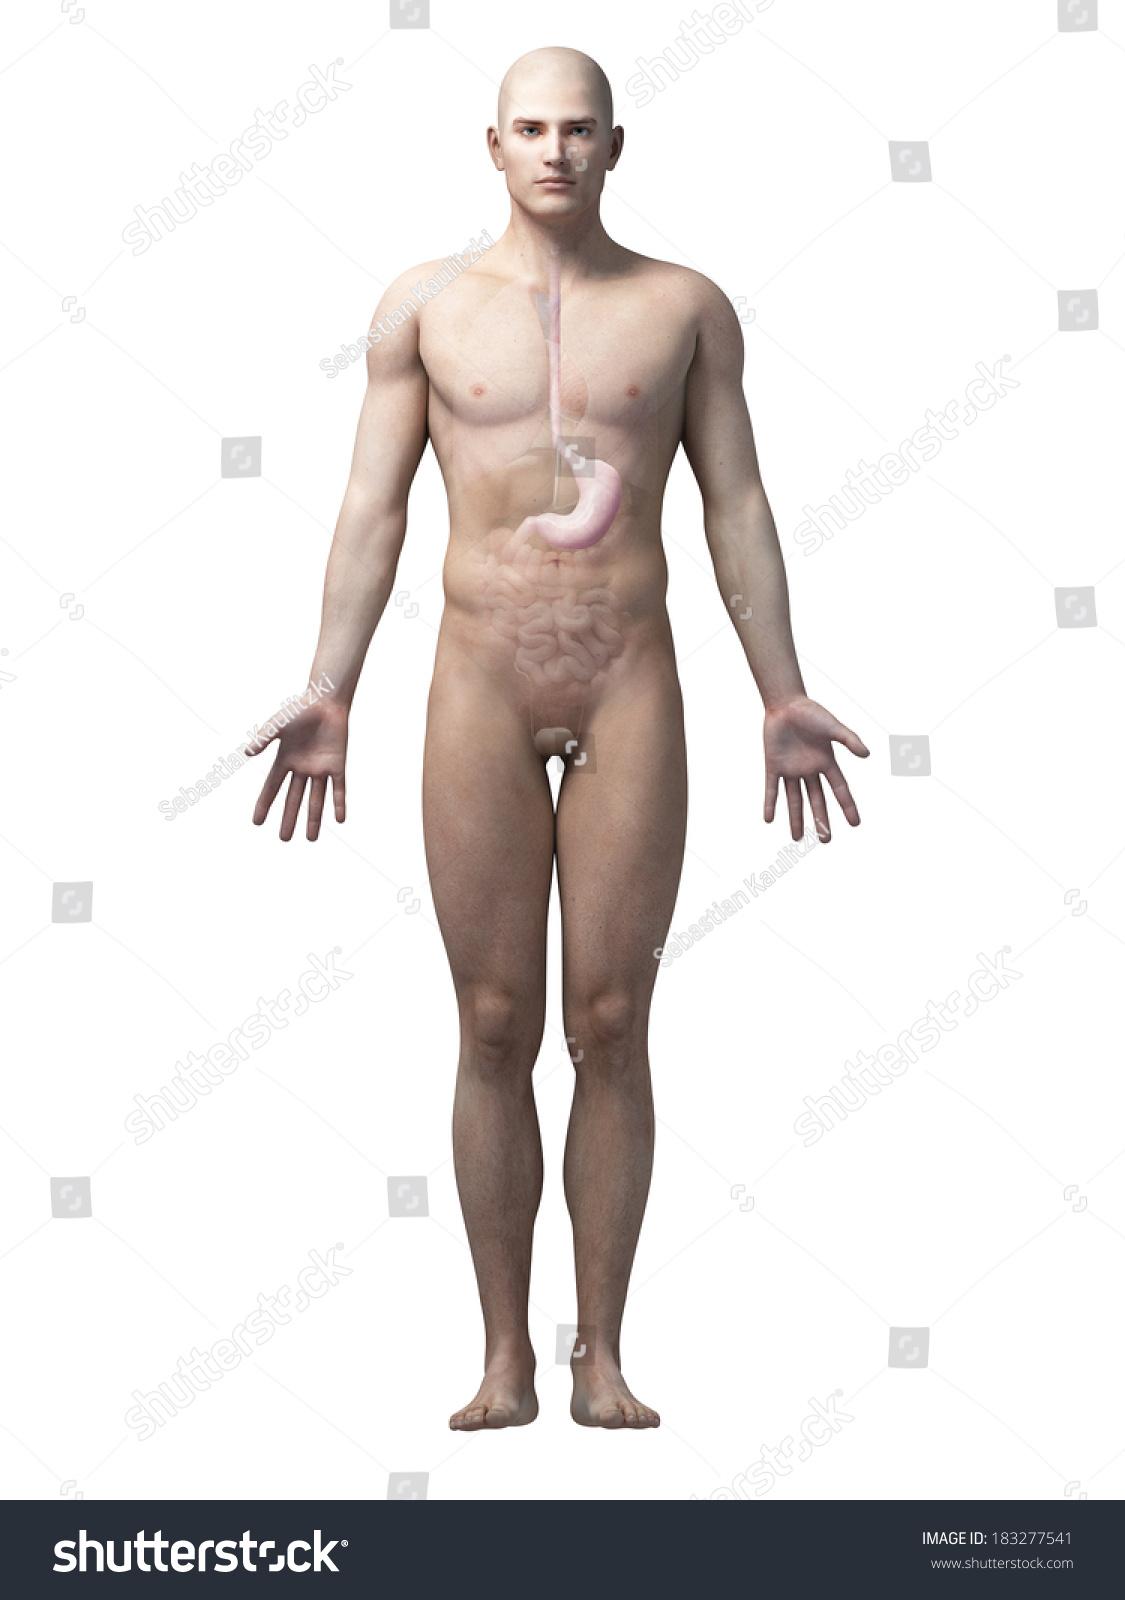 Male Anatomy Illustration Stomach Stock Illustration 183277541 ...